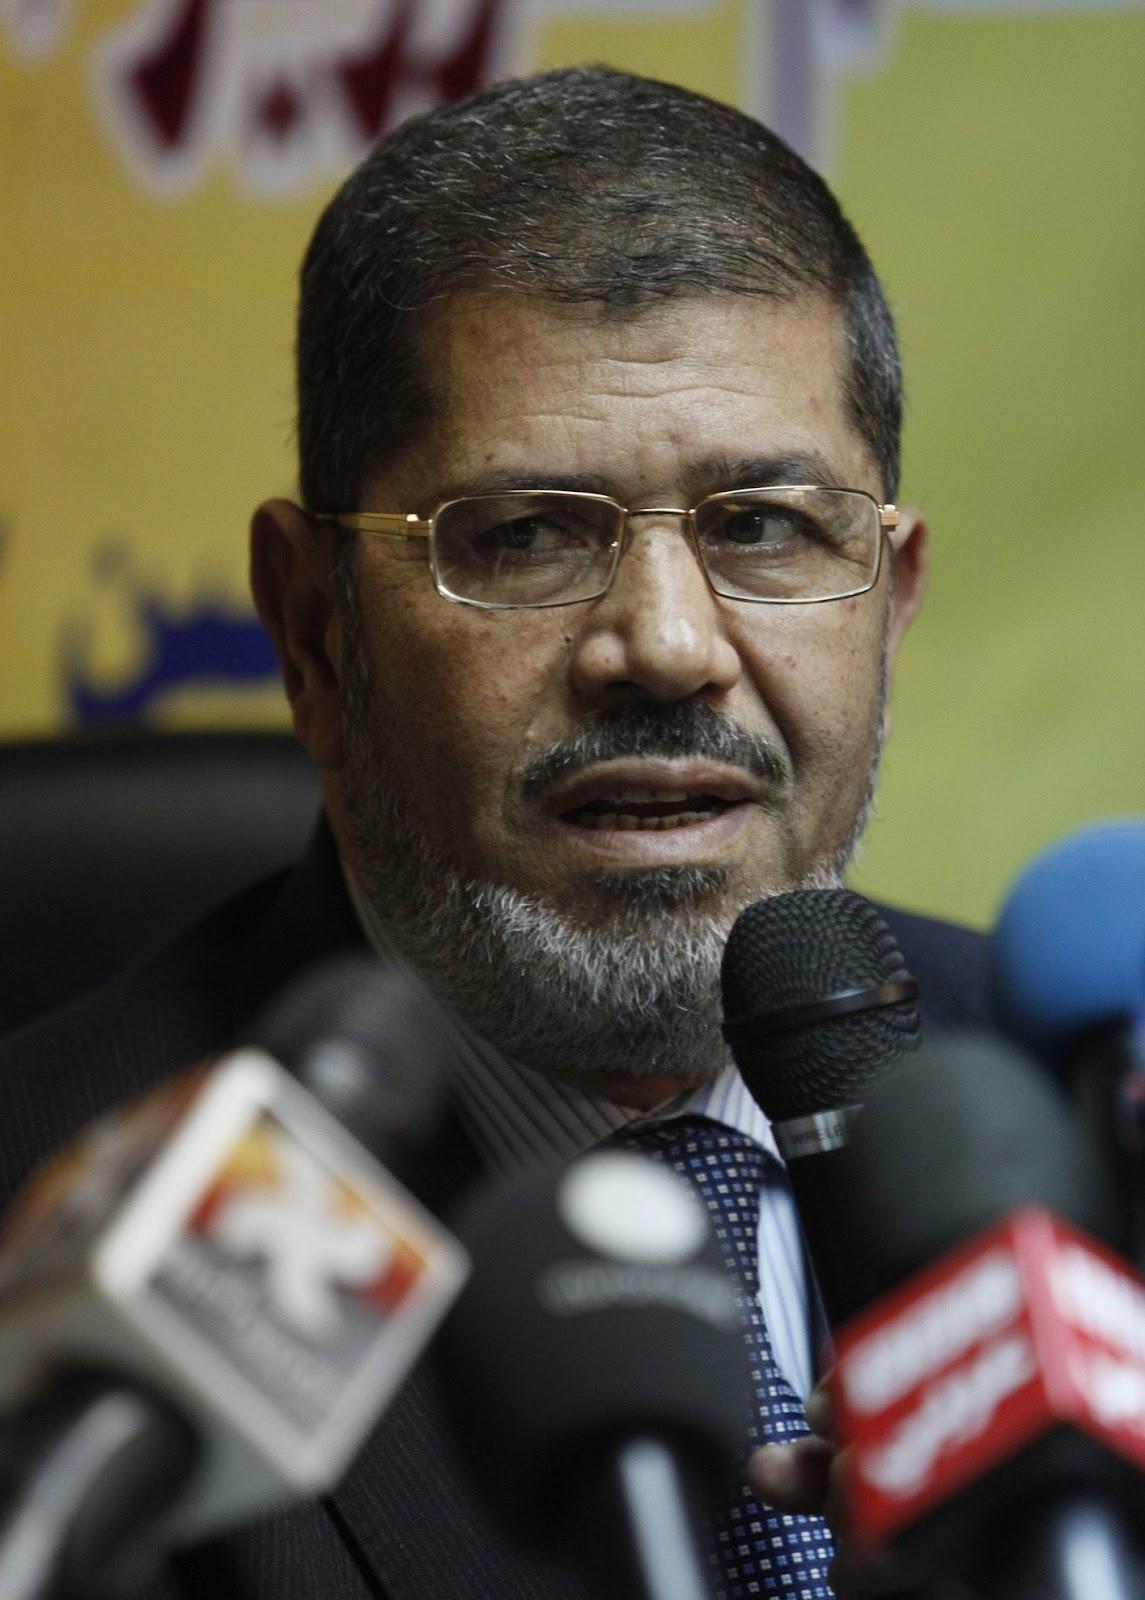 mohamed morsi biography Mohamed morsi muhammad morsi isa al-ayyat (în arabă محمد مرسى عيسى العياط, n 20 august 1951) este un politician egiptean și ex-președinte al egiptului.